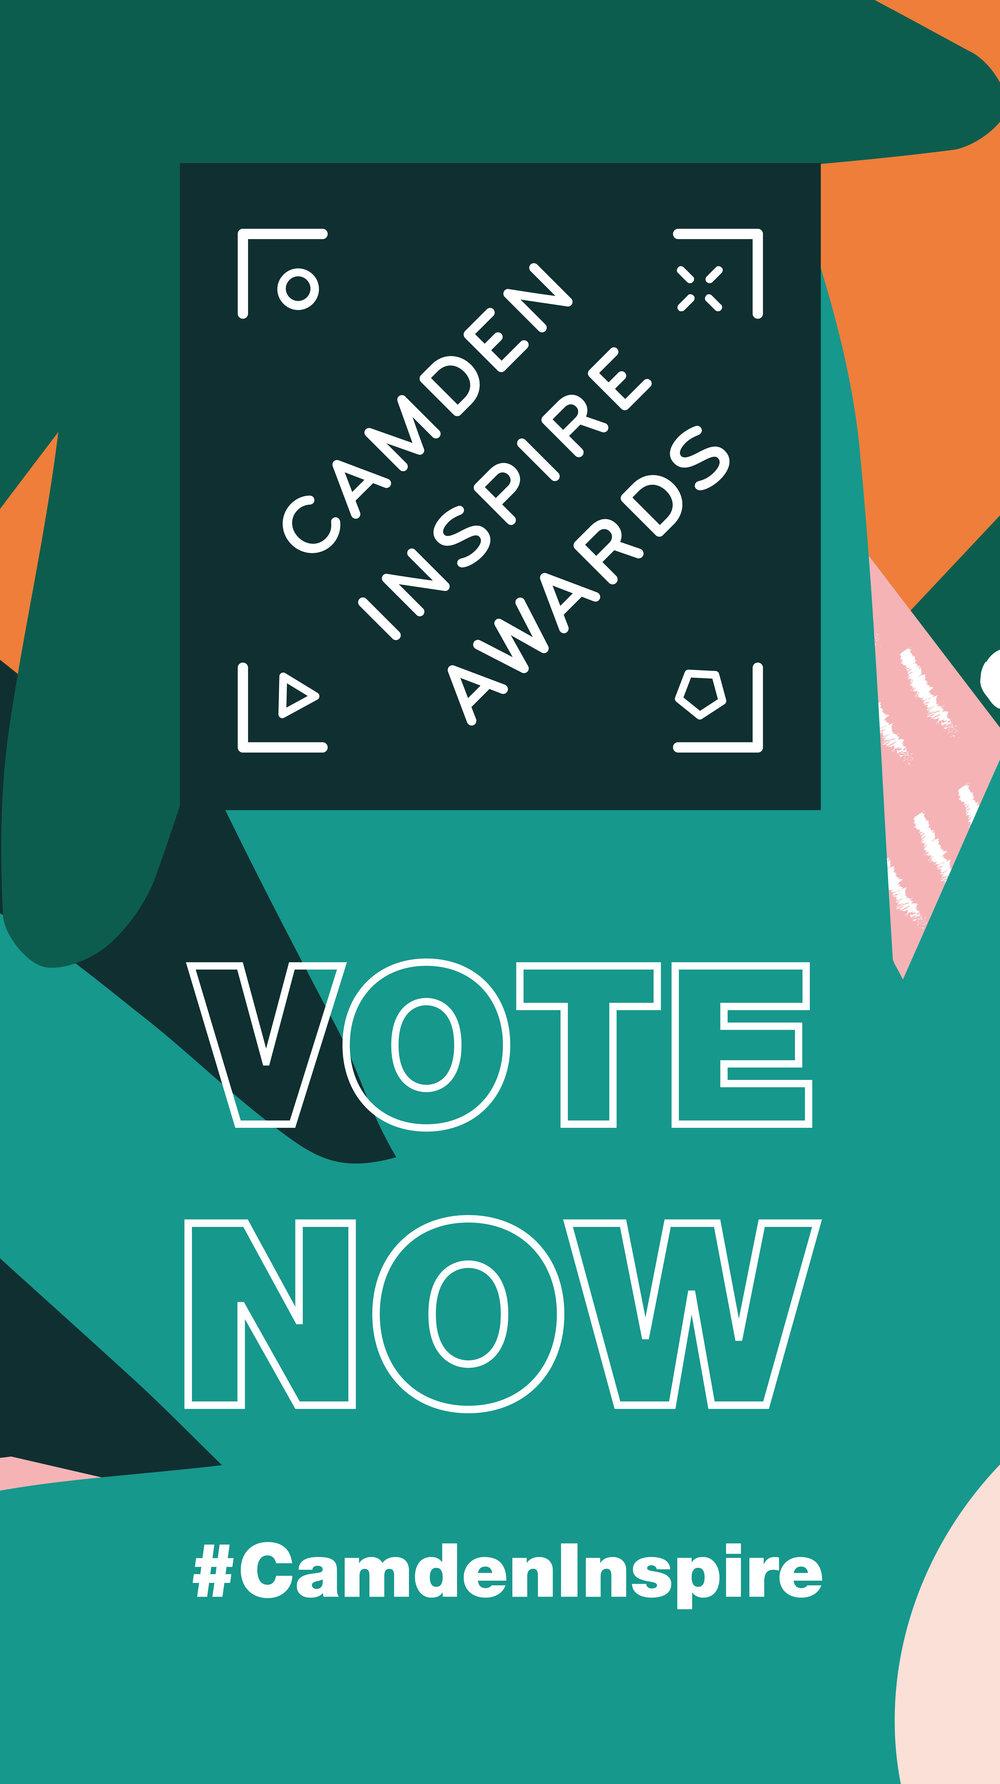 Inspire insta story vote now .jpg